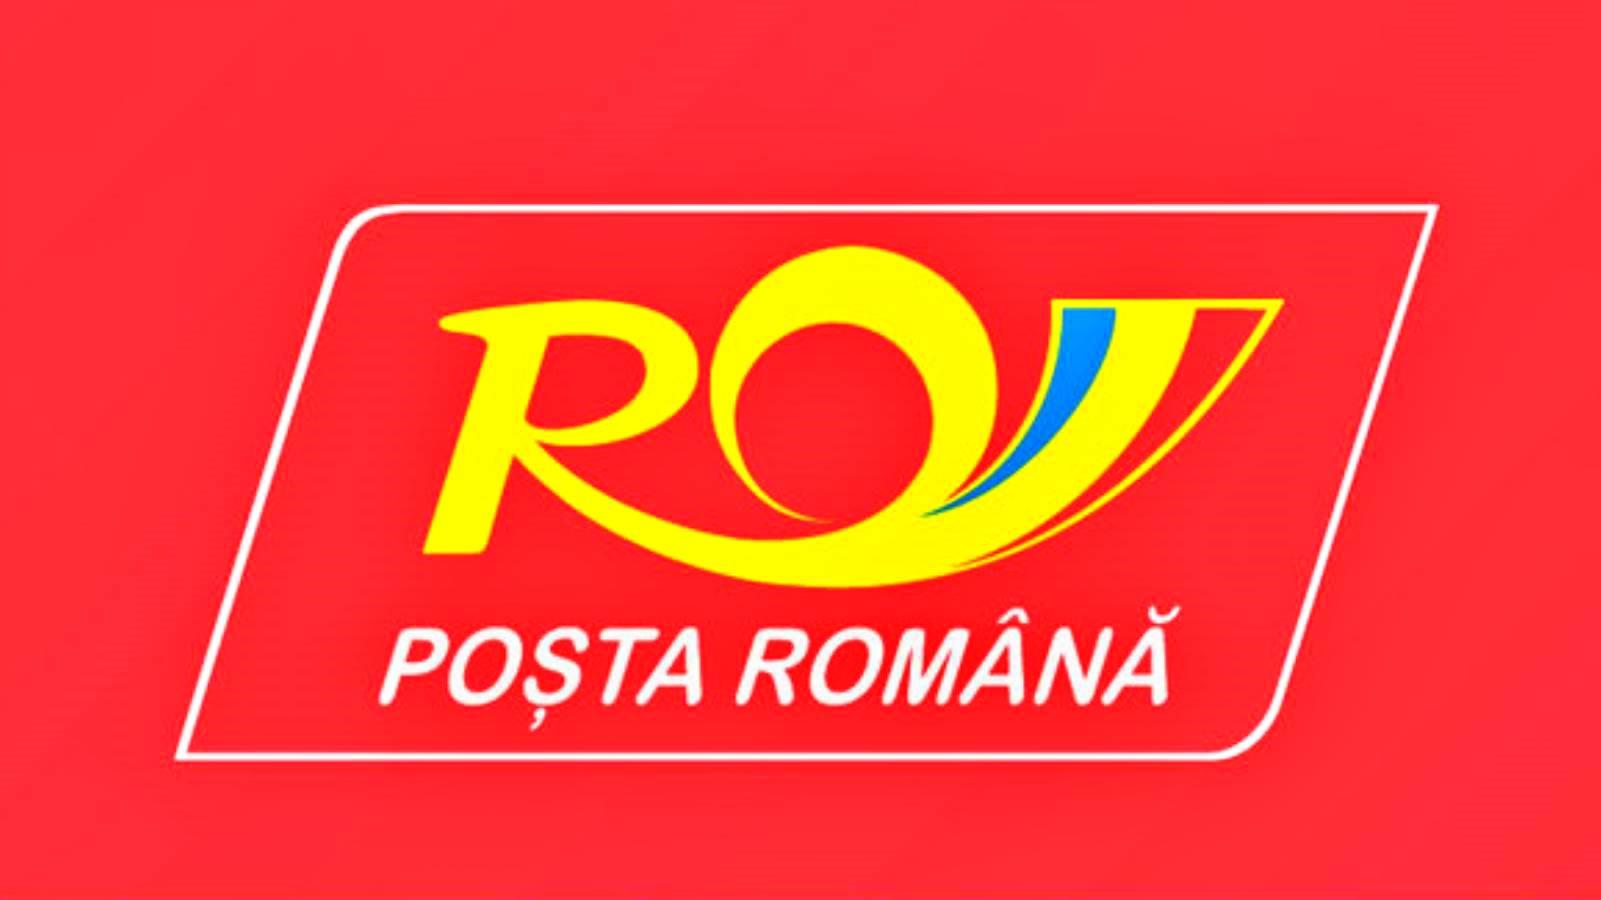 Posta Romana Mesajul Oficial privind Livrarea Coletelor